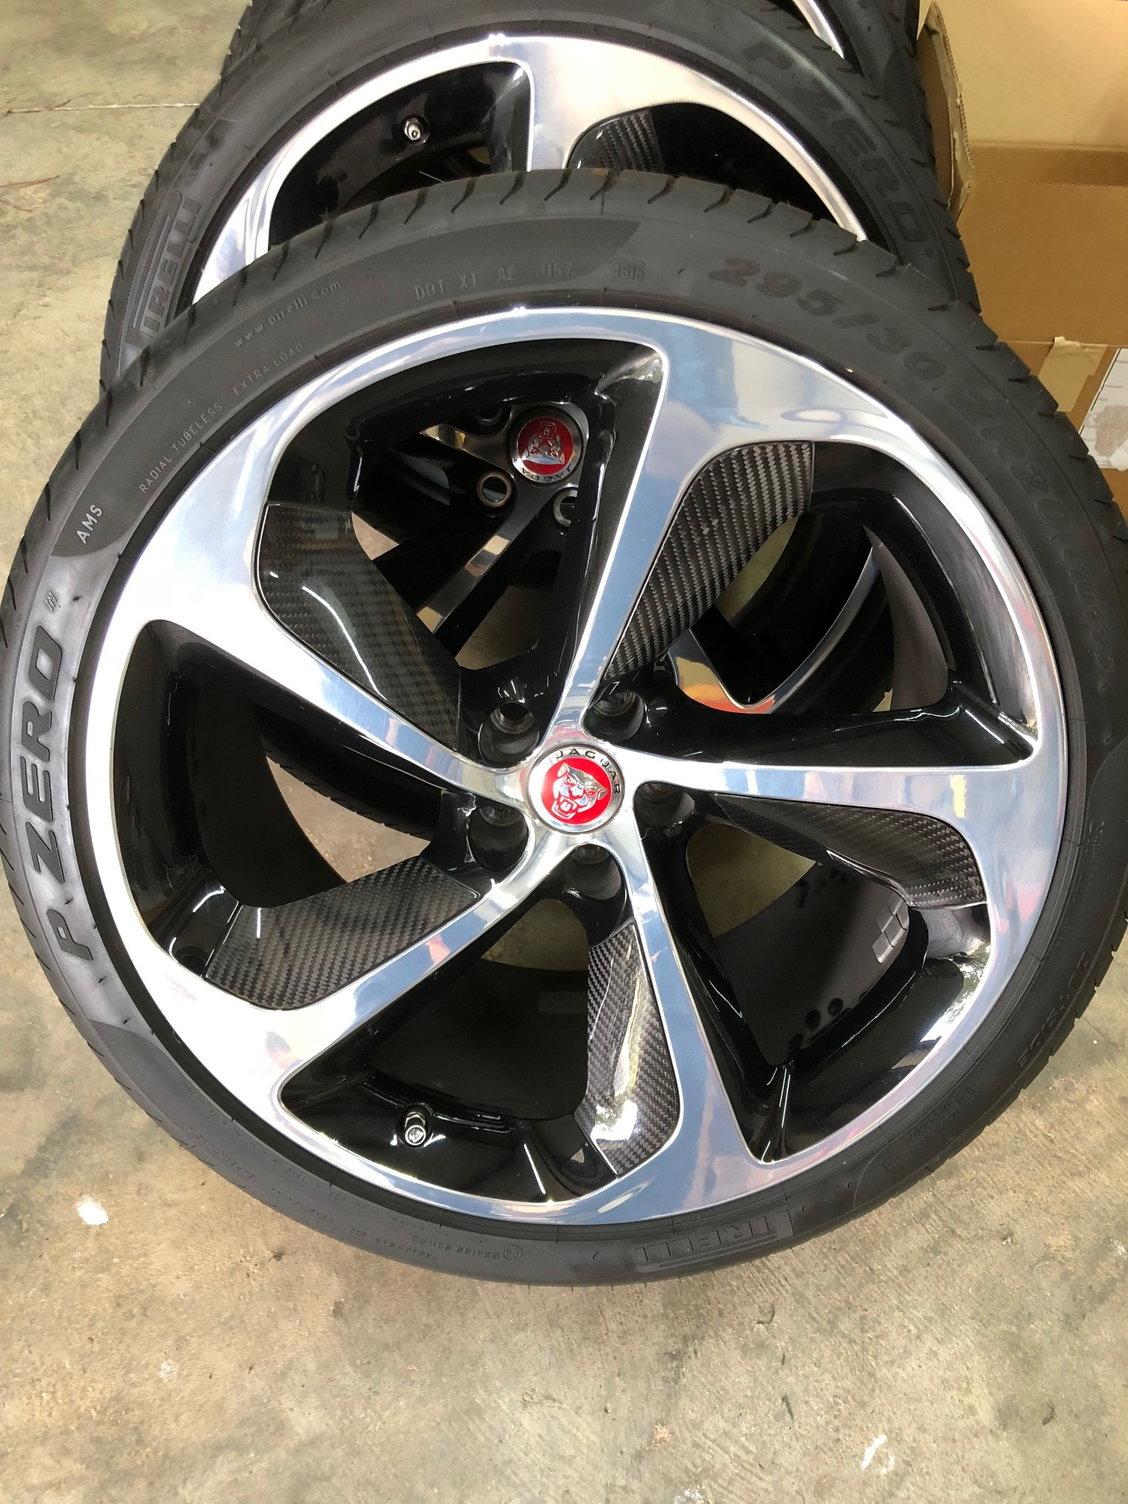 Used Wheels For Sale >> Jaguar F Type Set Of 4 Oem Used Wheels For Sale Jaguar Forums